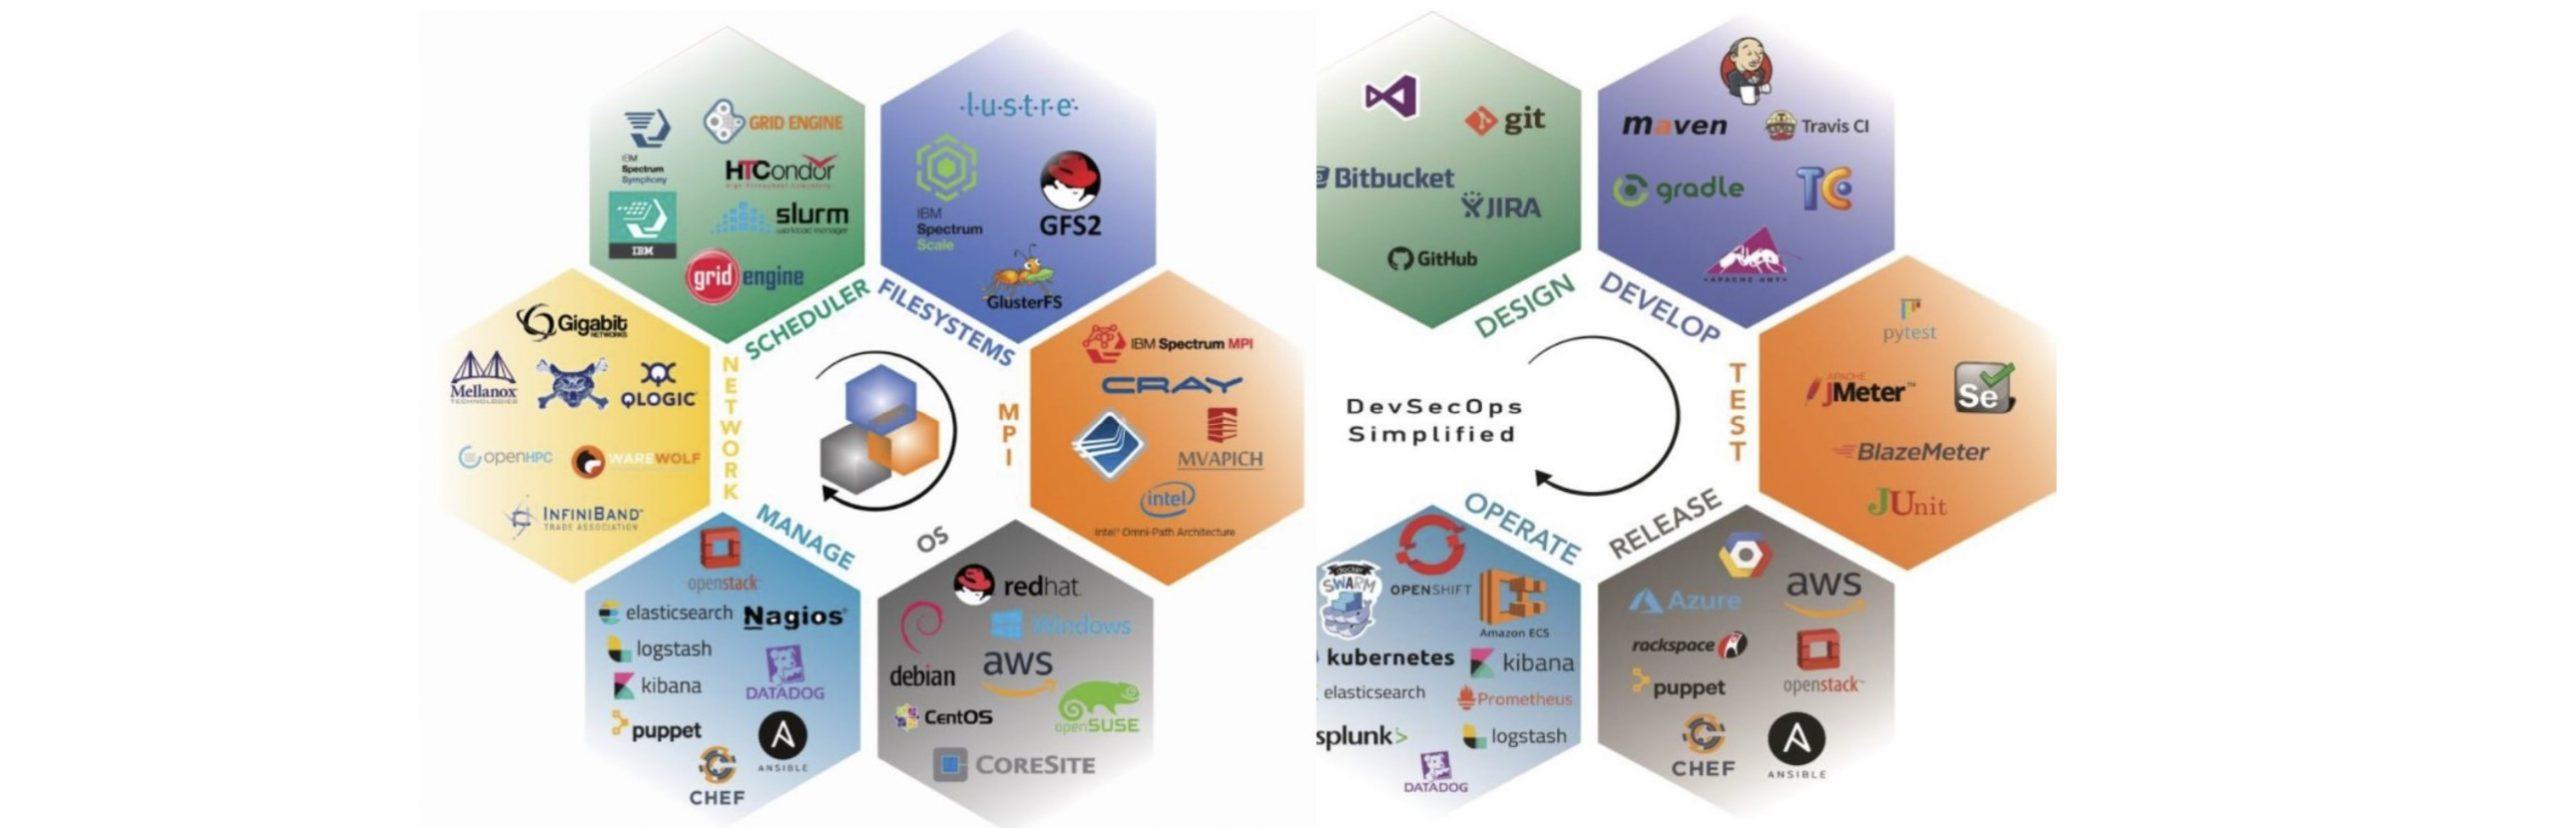 CoreHive<b> HPC & Cloud </b> Solutions.